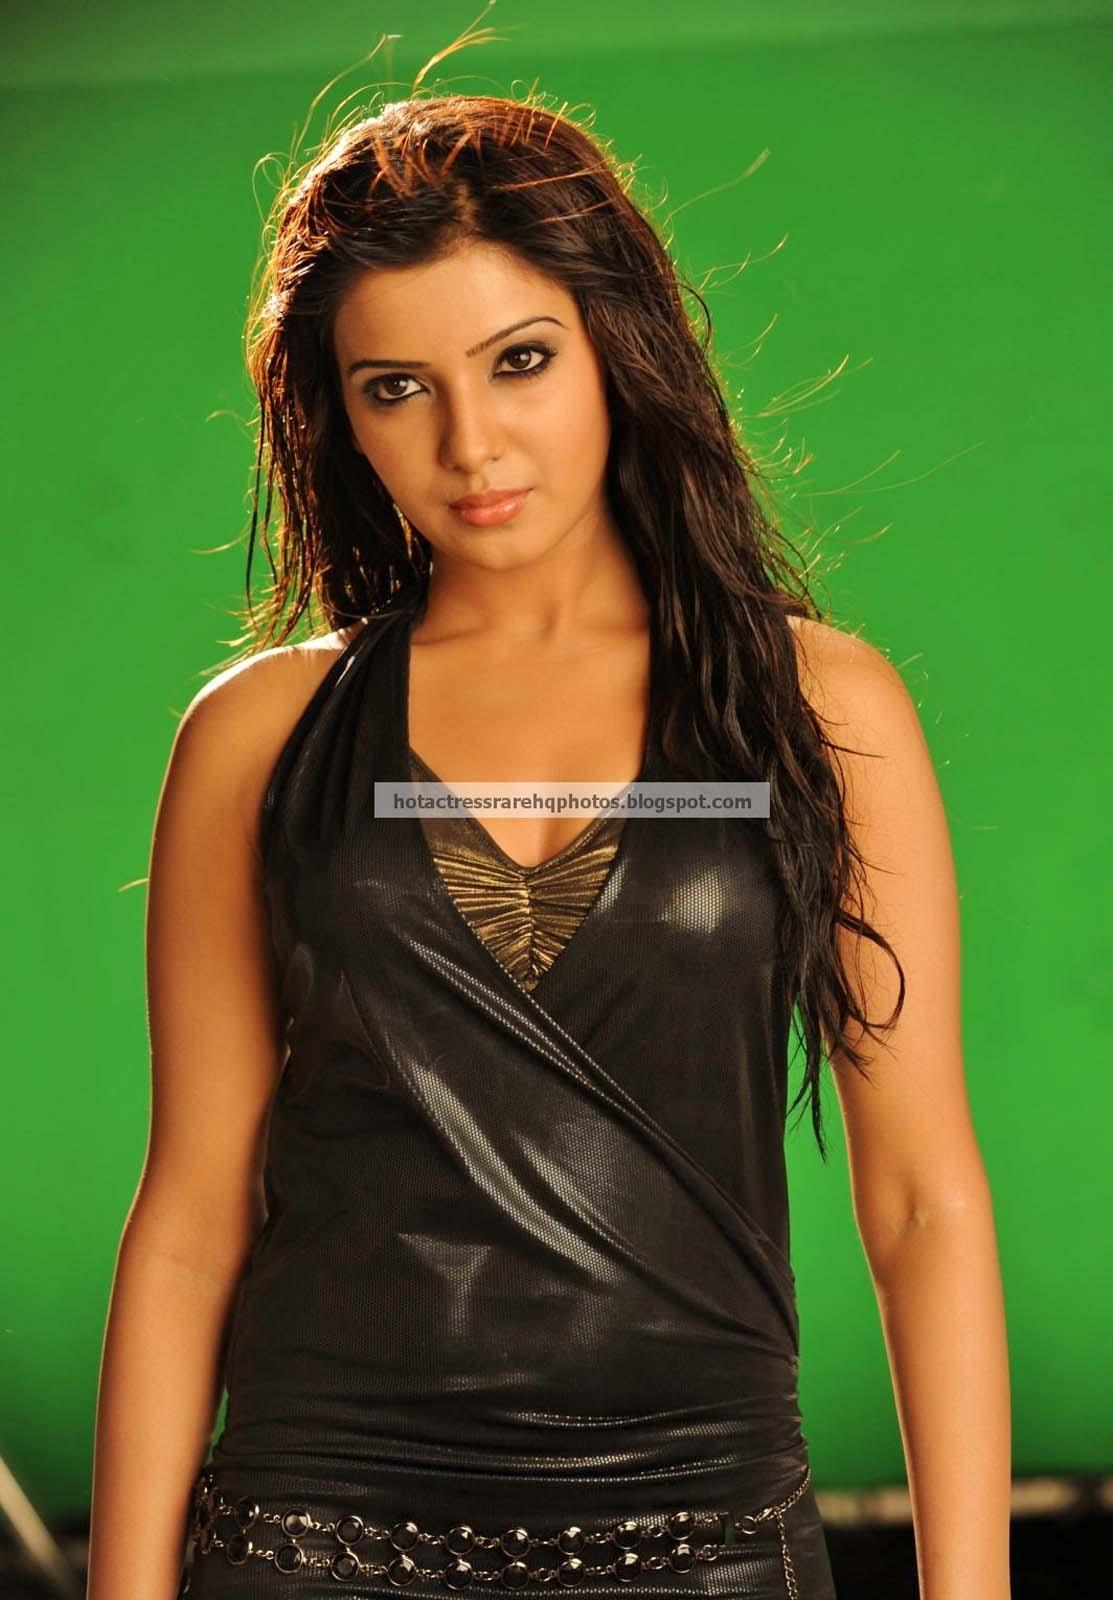 Samantha In Saree: Hot Indian Actress Rare HQ Photos: Samantha Ruth Prabhu